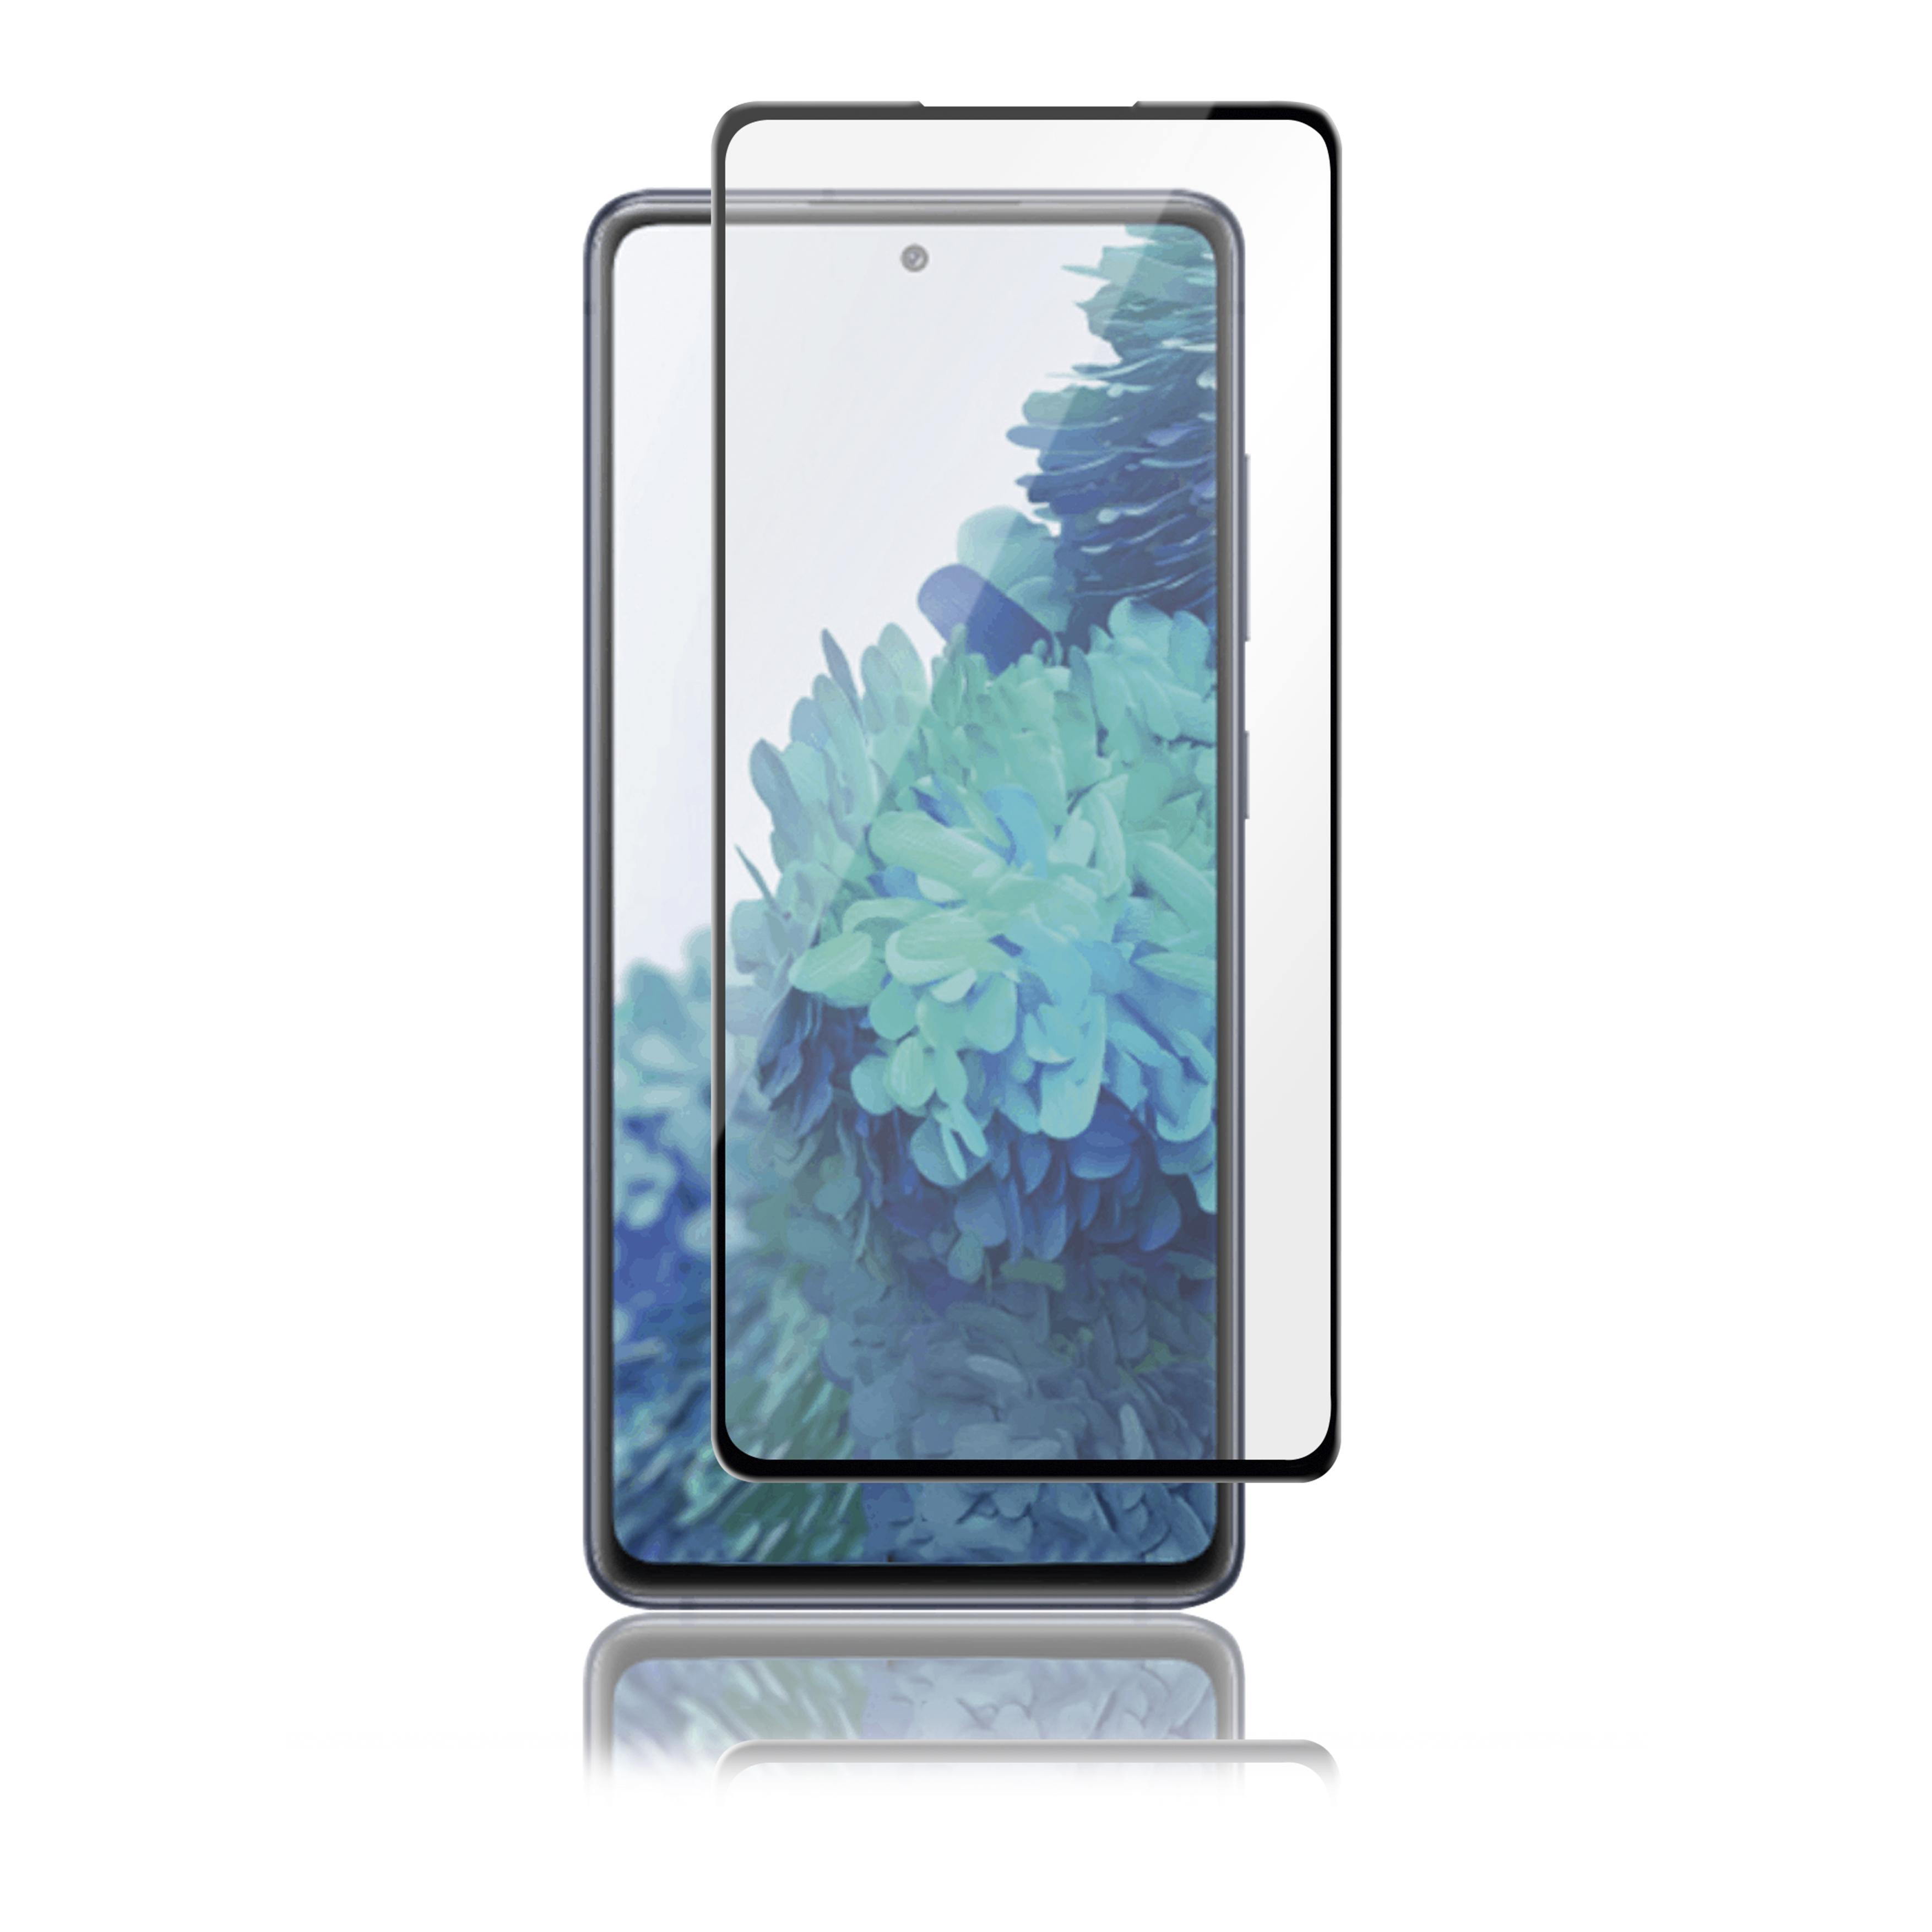 Full-Fit Glass Samsung Galaxy S20 FE Black